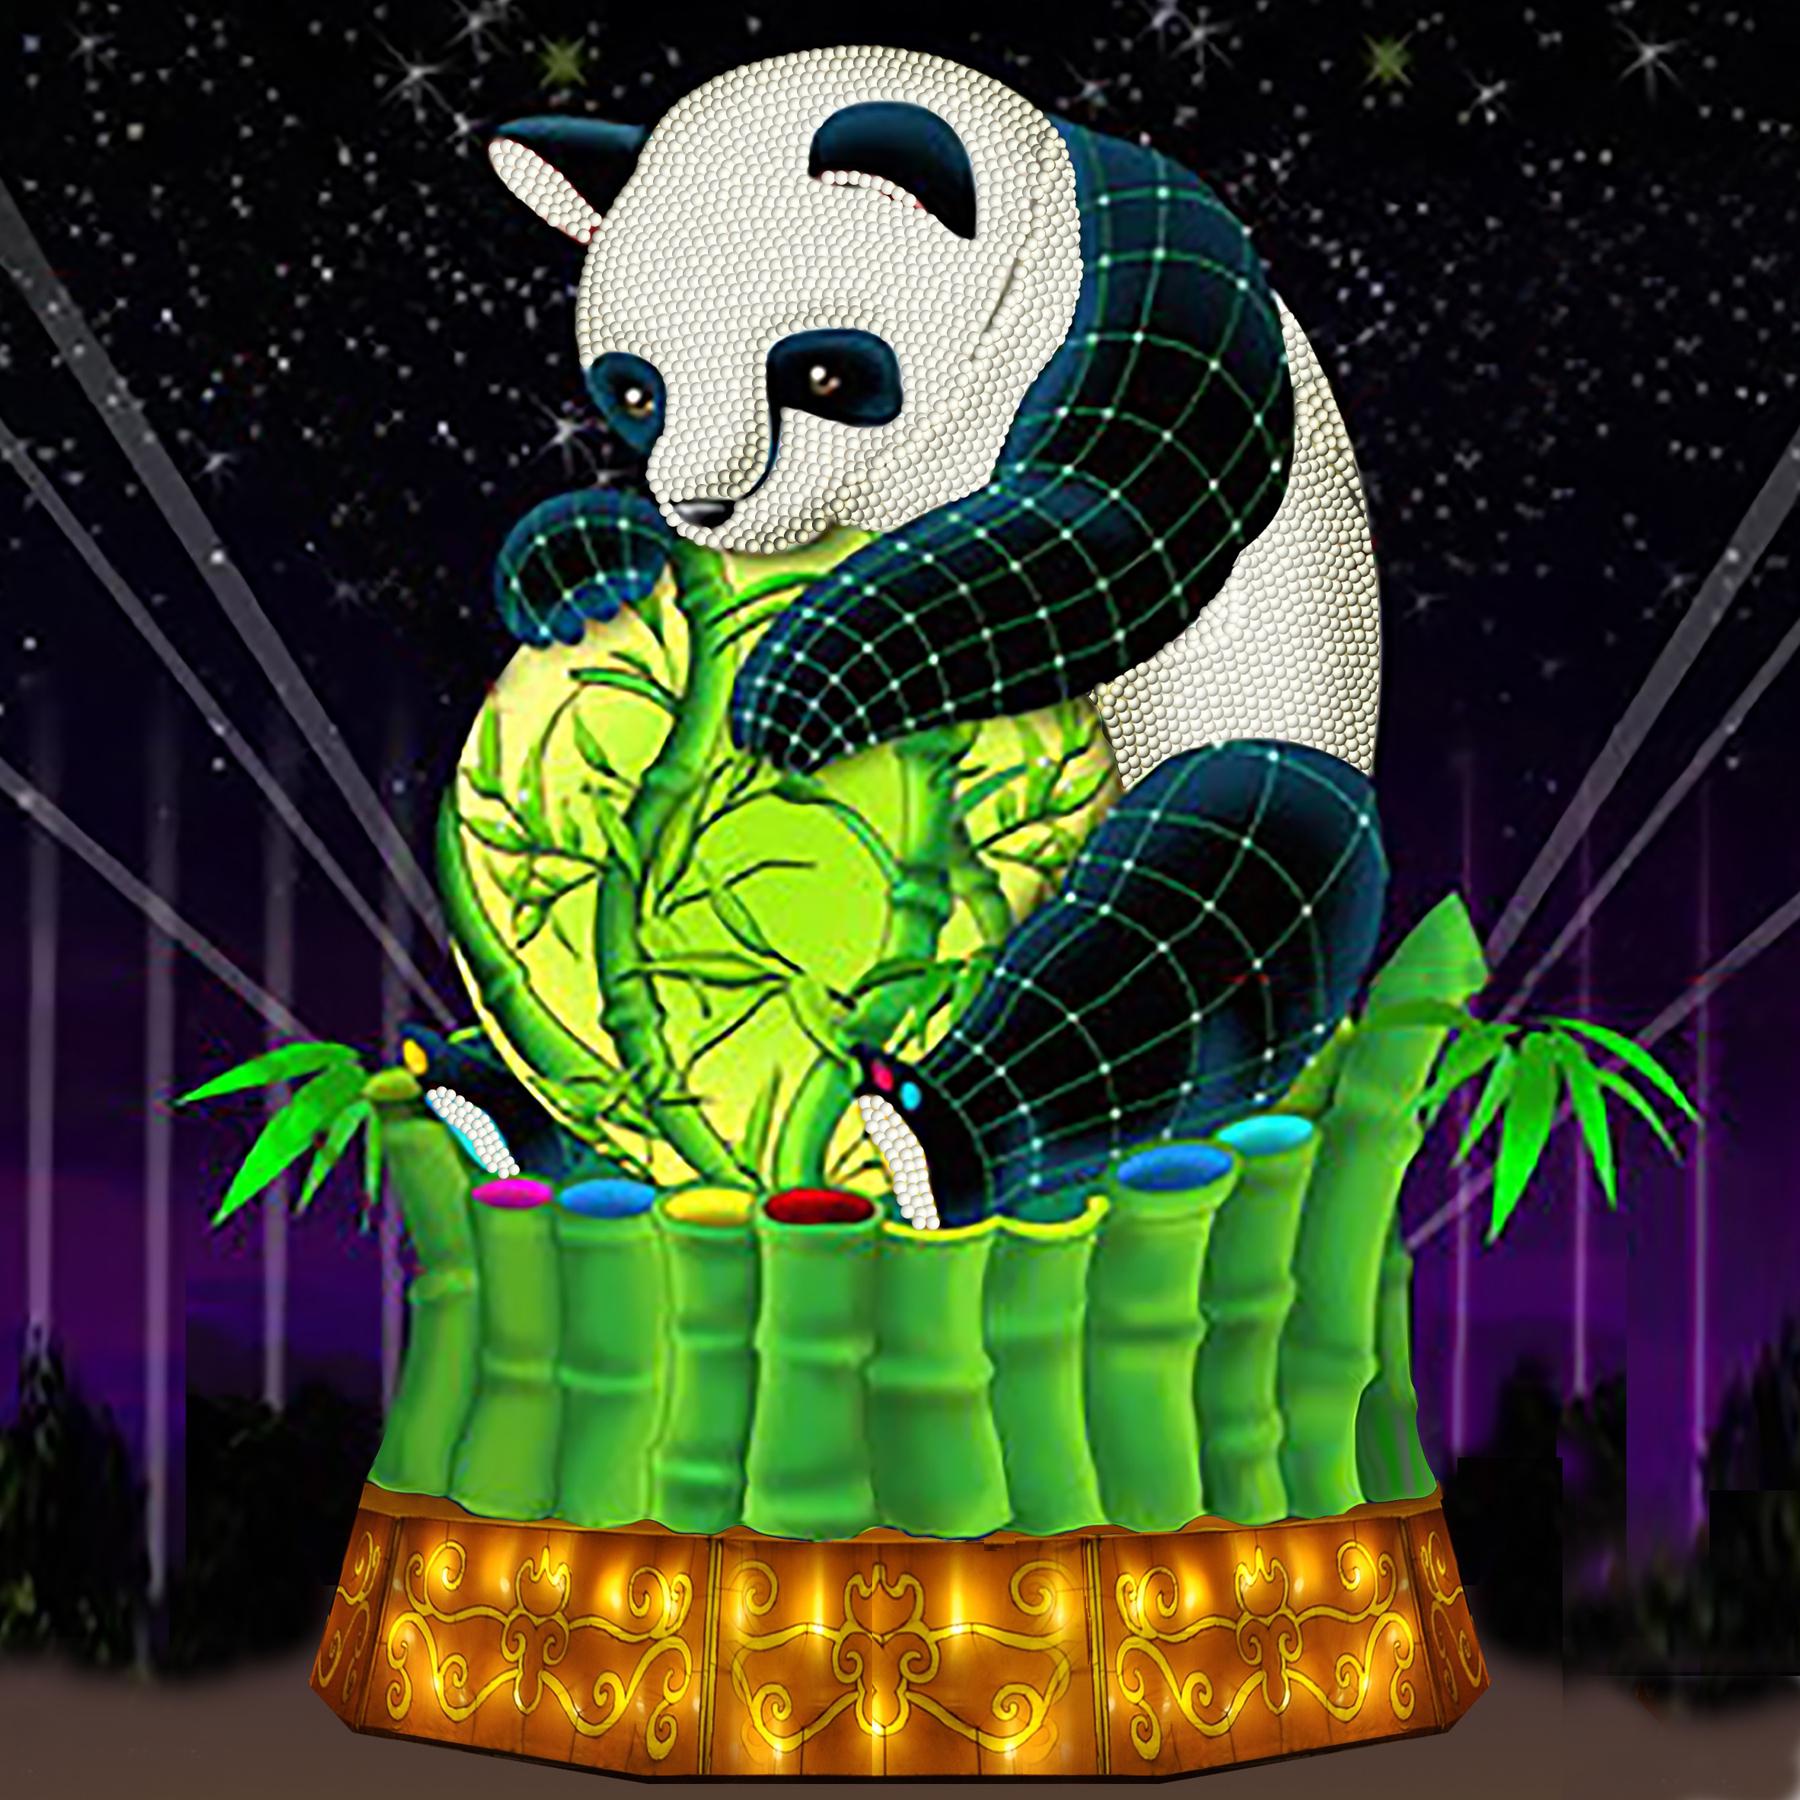 Ticket Sales Begin for World-Class Chinese Lantern Festival at Boerner Botanical Gardens, Sept. 21–Oct. 21